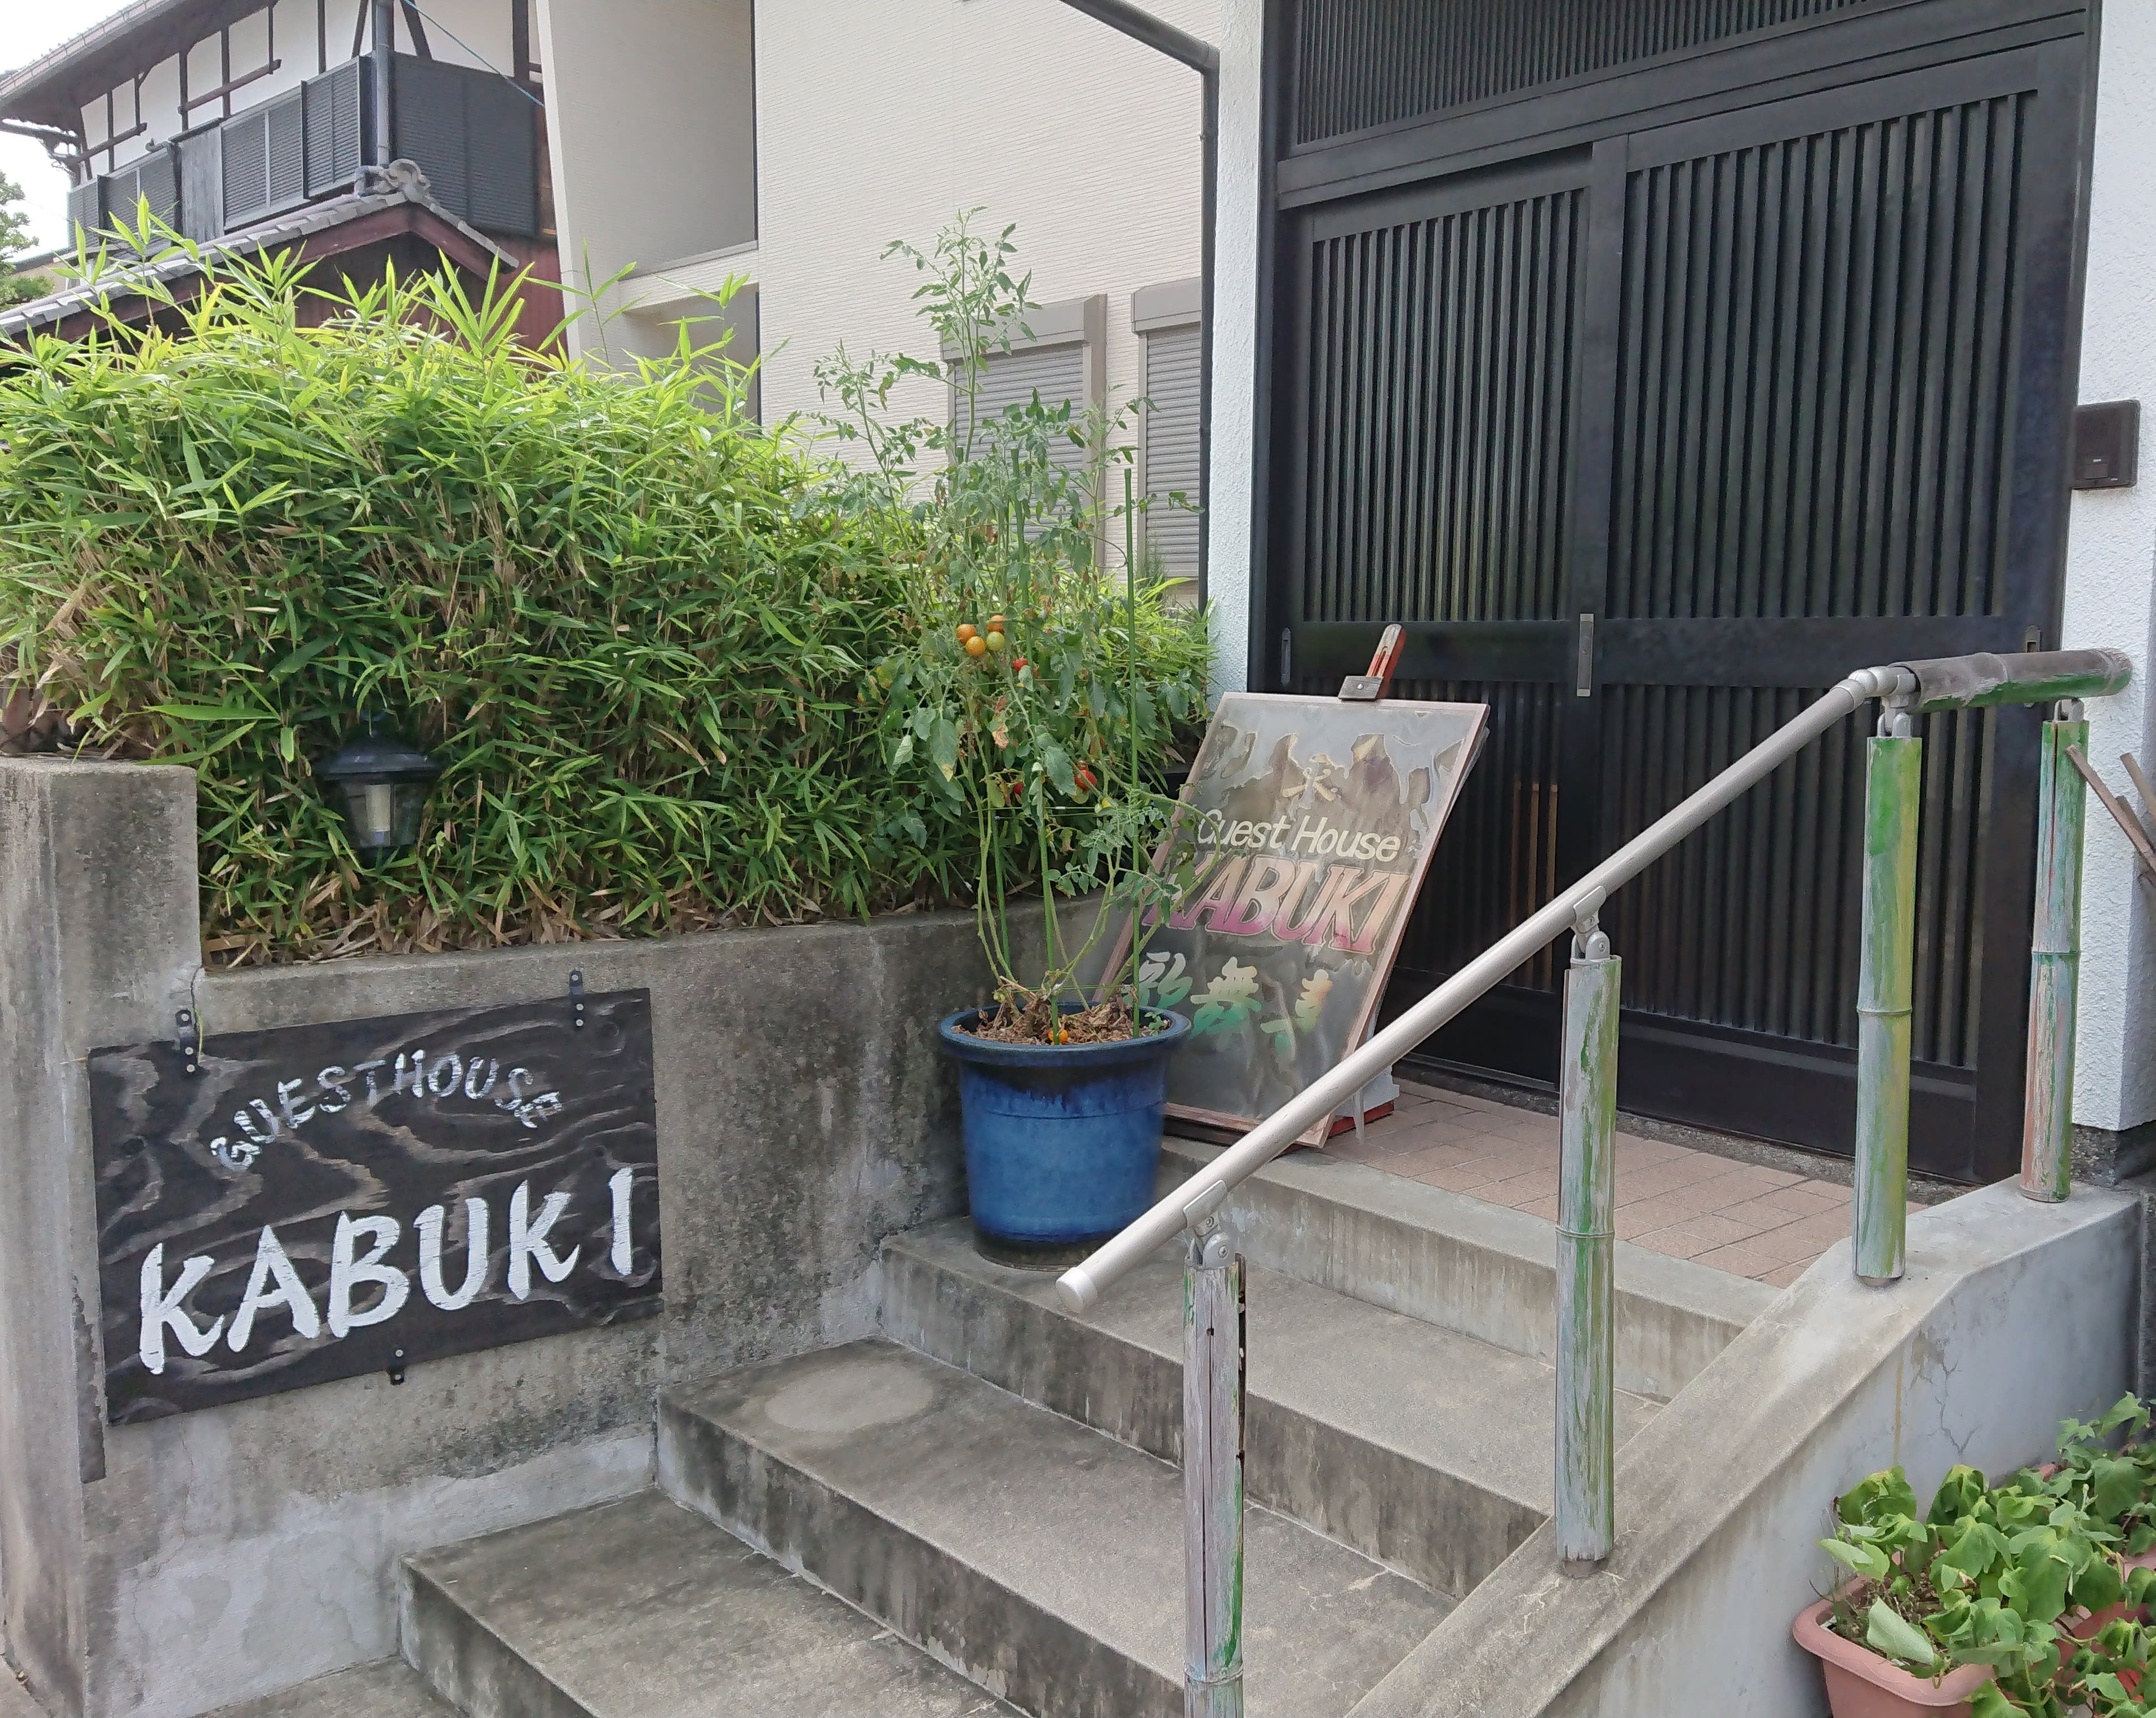 Guest House Renjishi Kabuki